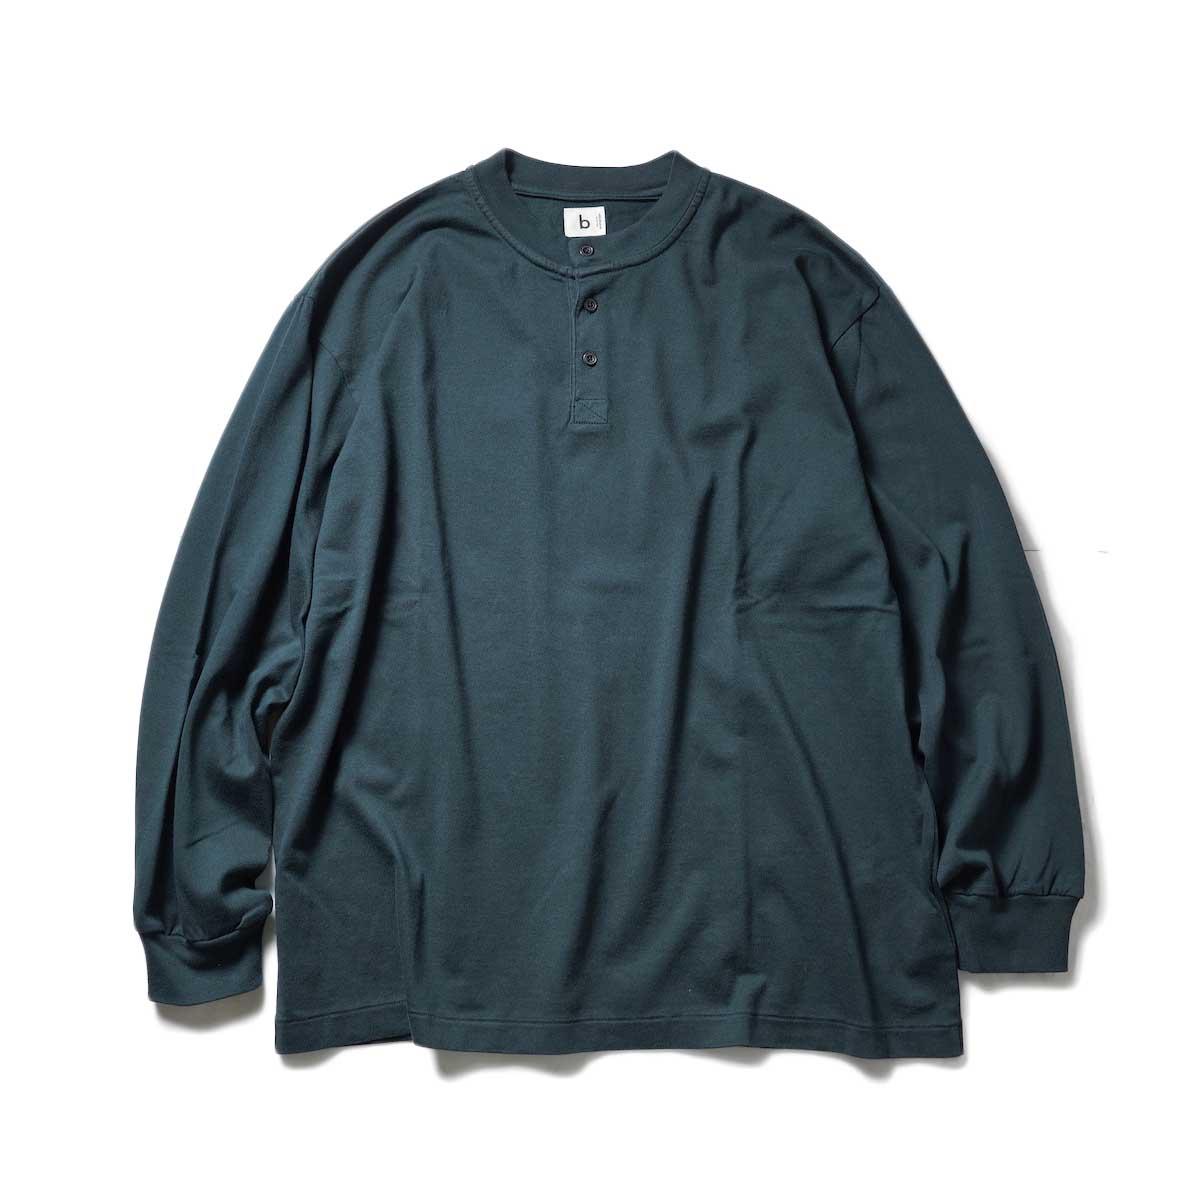 blurhms / Extra Soft Henley-neck BIG L/S (BlackGreen)